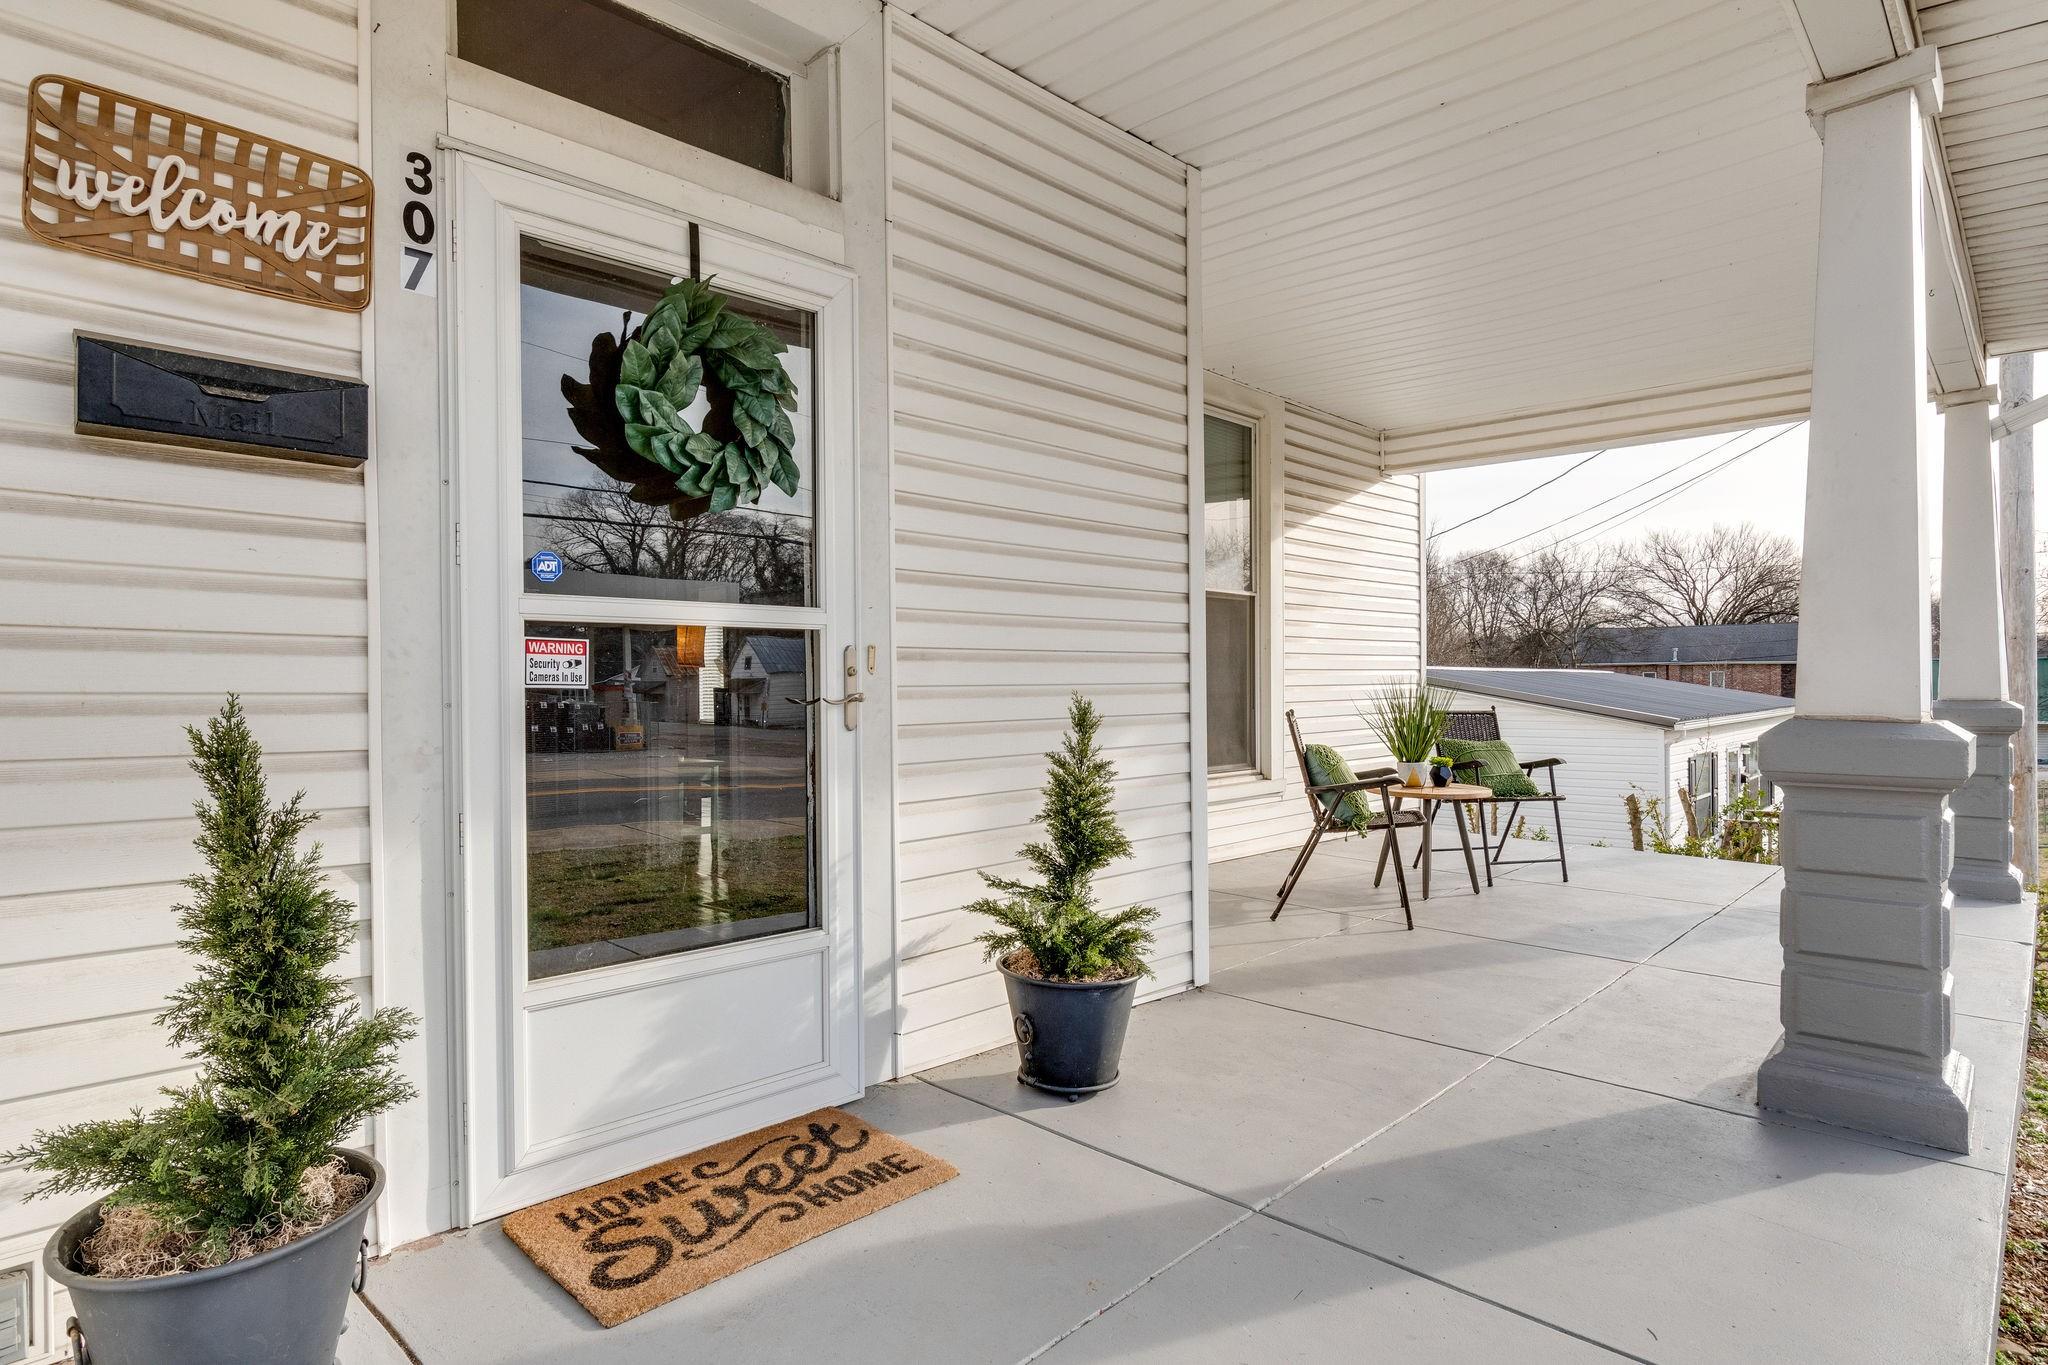 307 S Main St, Mount Pleasant, TN 38474 - Mount Pleasant, TN real estate listing